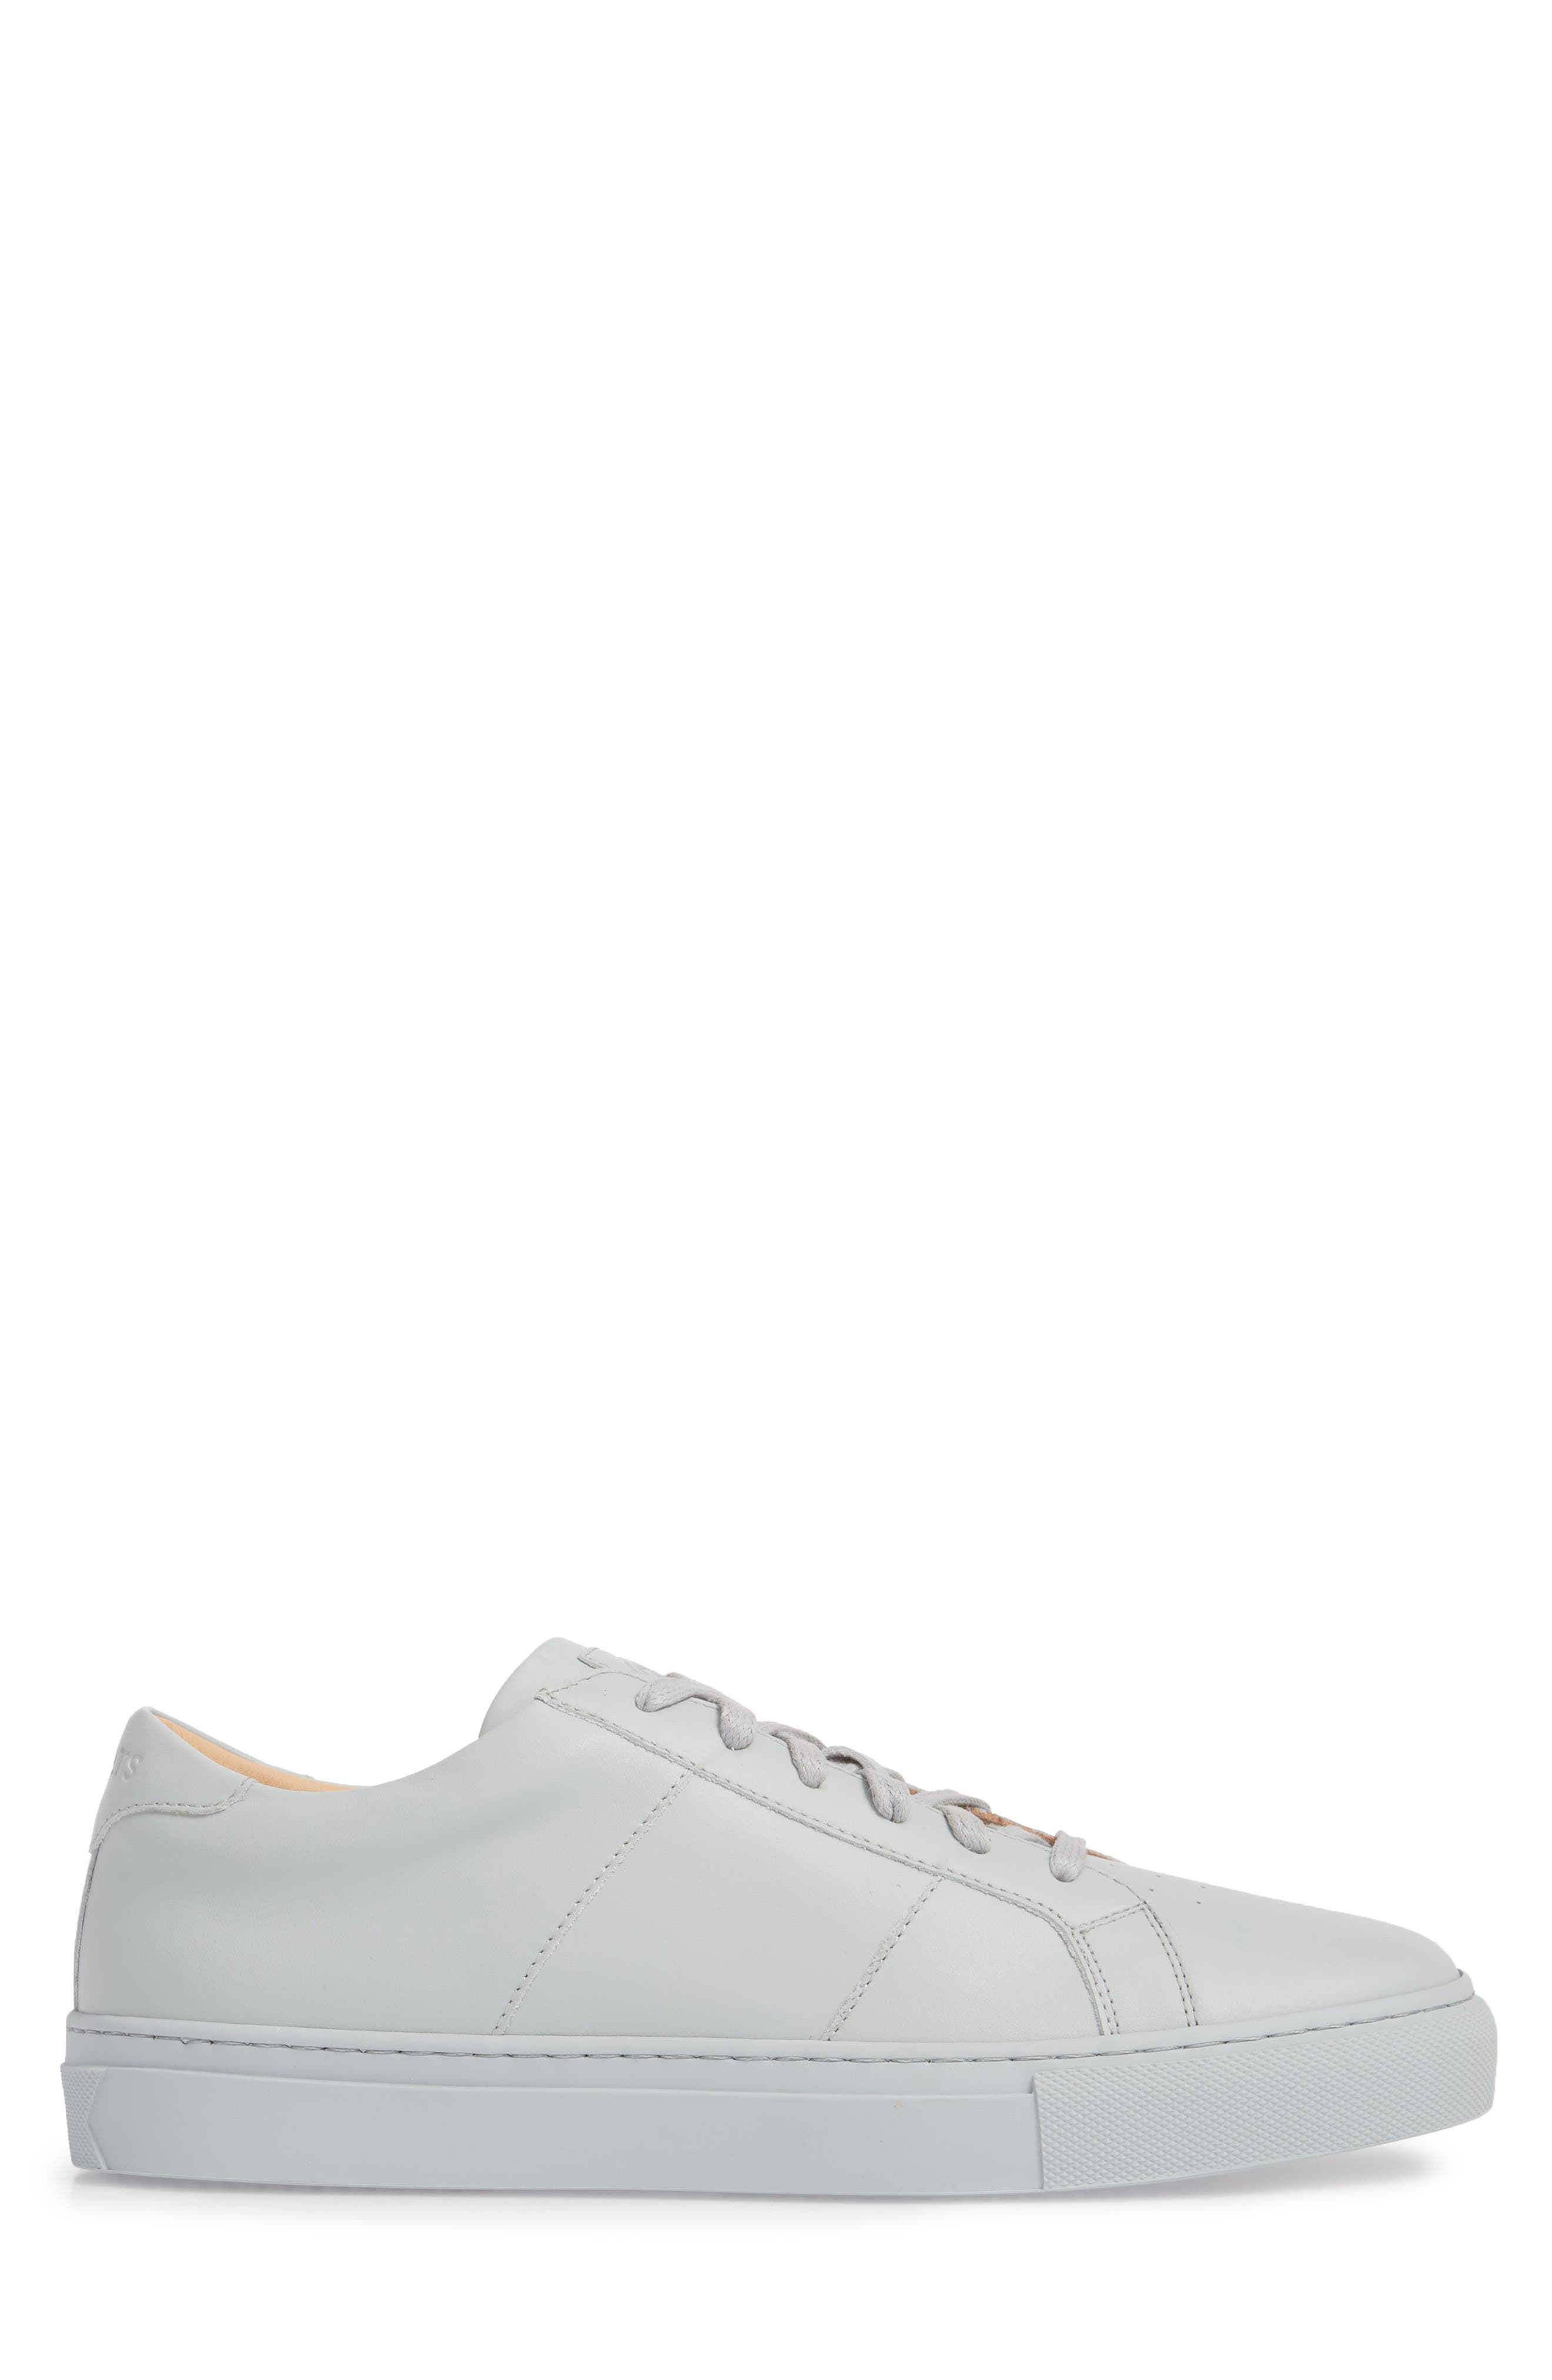 Royale Sneaker,                             Alternate thumbnail 3, color,                             Grey Tonal Leather